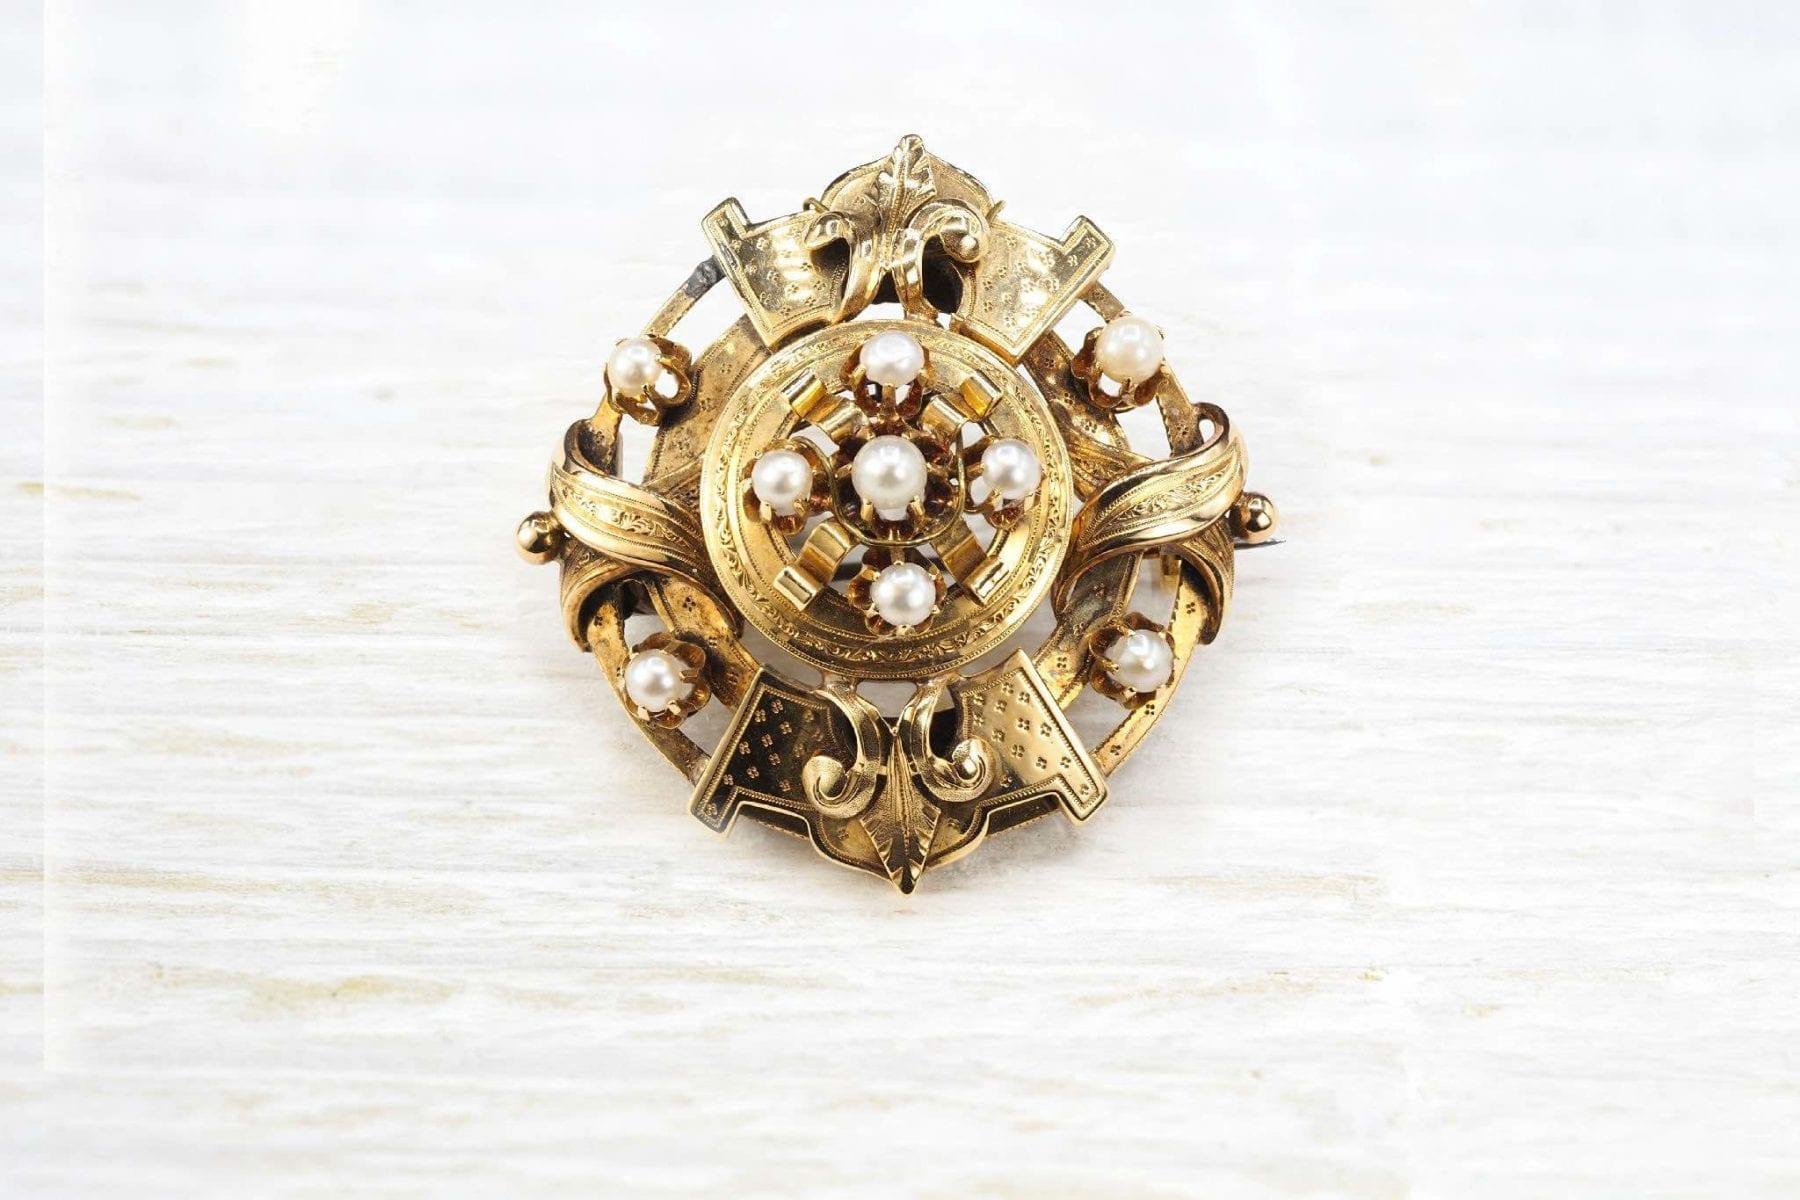 broche napoléon III or jaune et perles